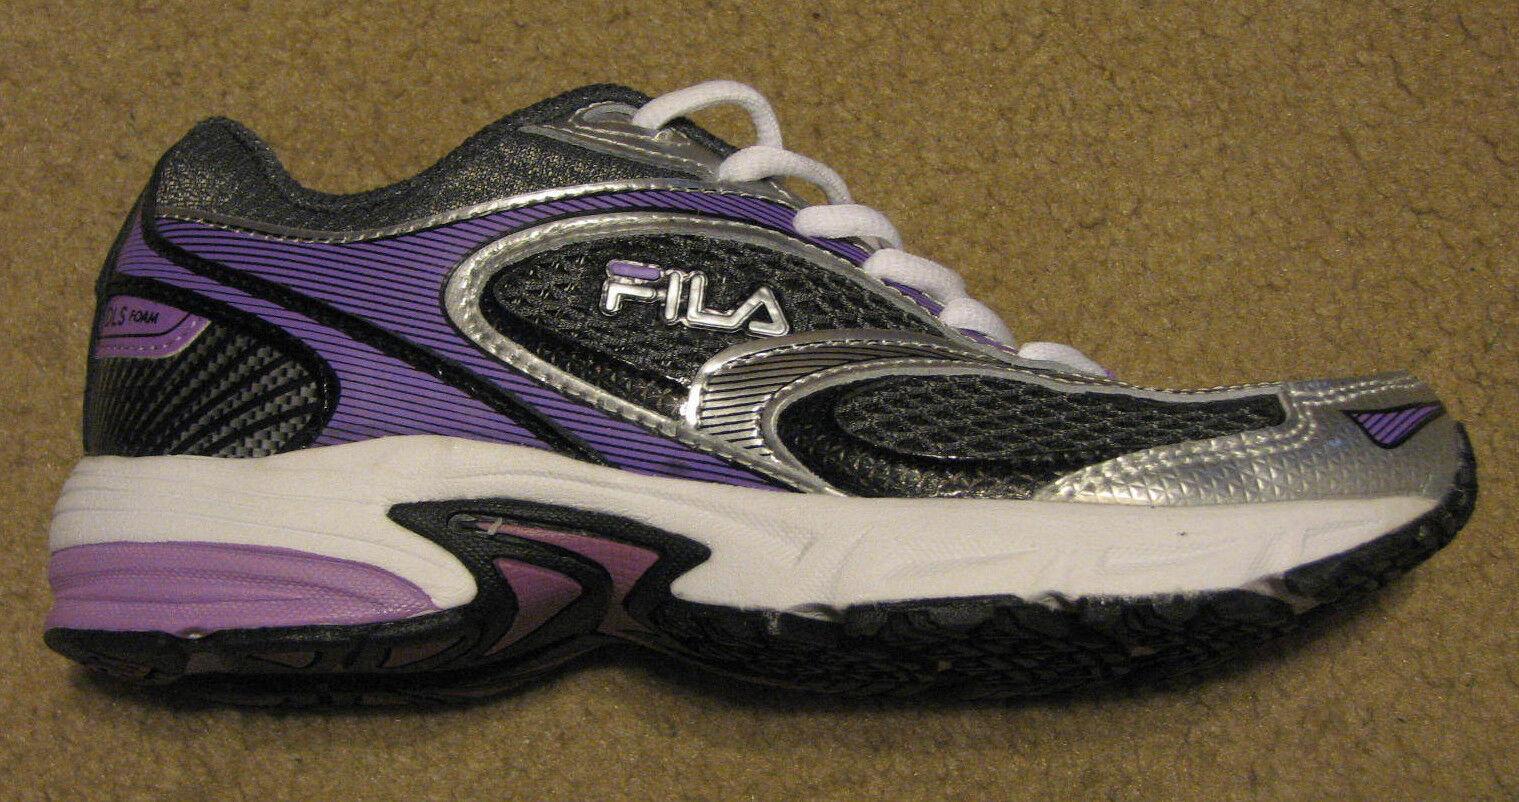 Women's FILA 6 DLS Artifice running shoes sneaker purple white black  Brand discount